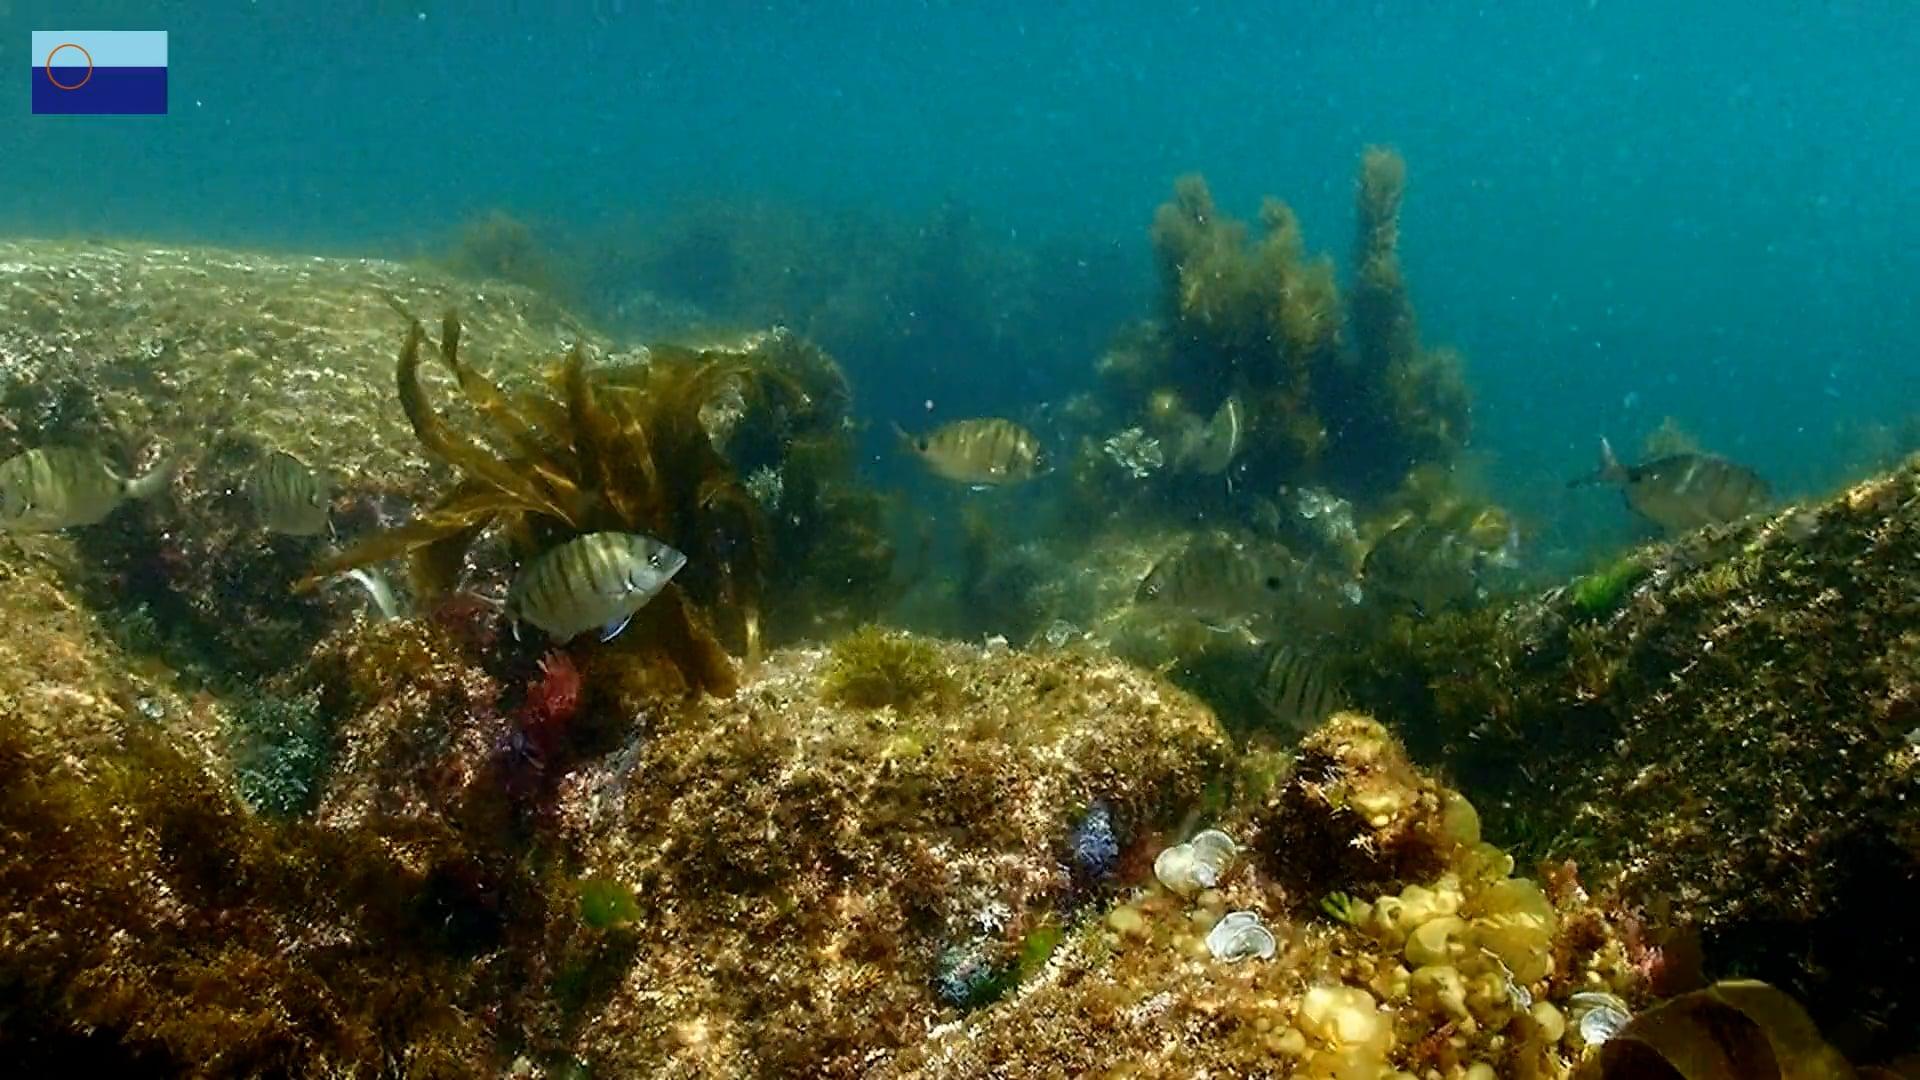 Un paseo bajo el mar / Un paseo baixo o mar - Parque Nacional das Illas Atlánticas de Galicia